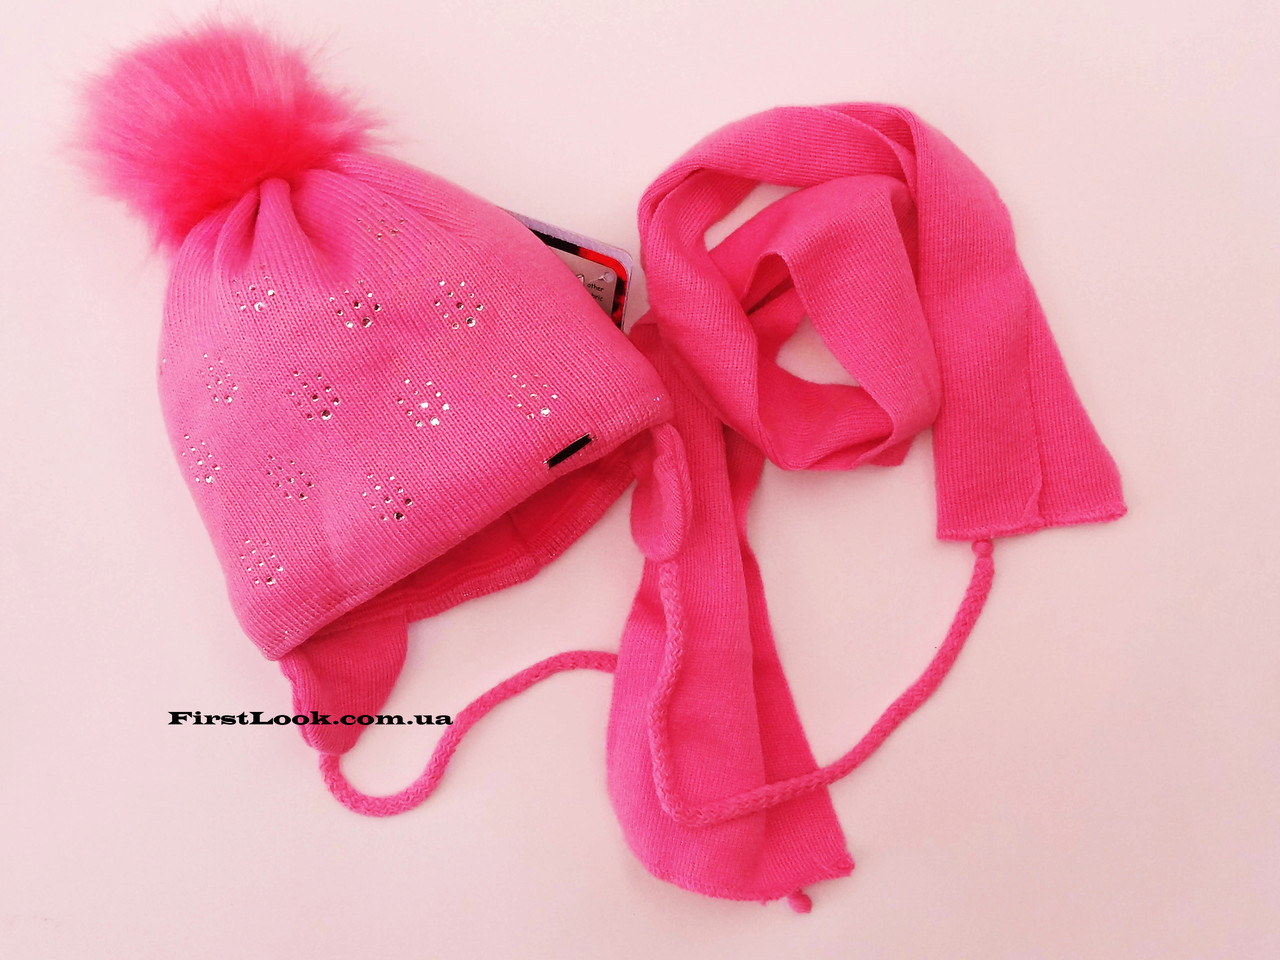 Детский комплект шапка и шарф на флисе,размер(2-3 года)